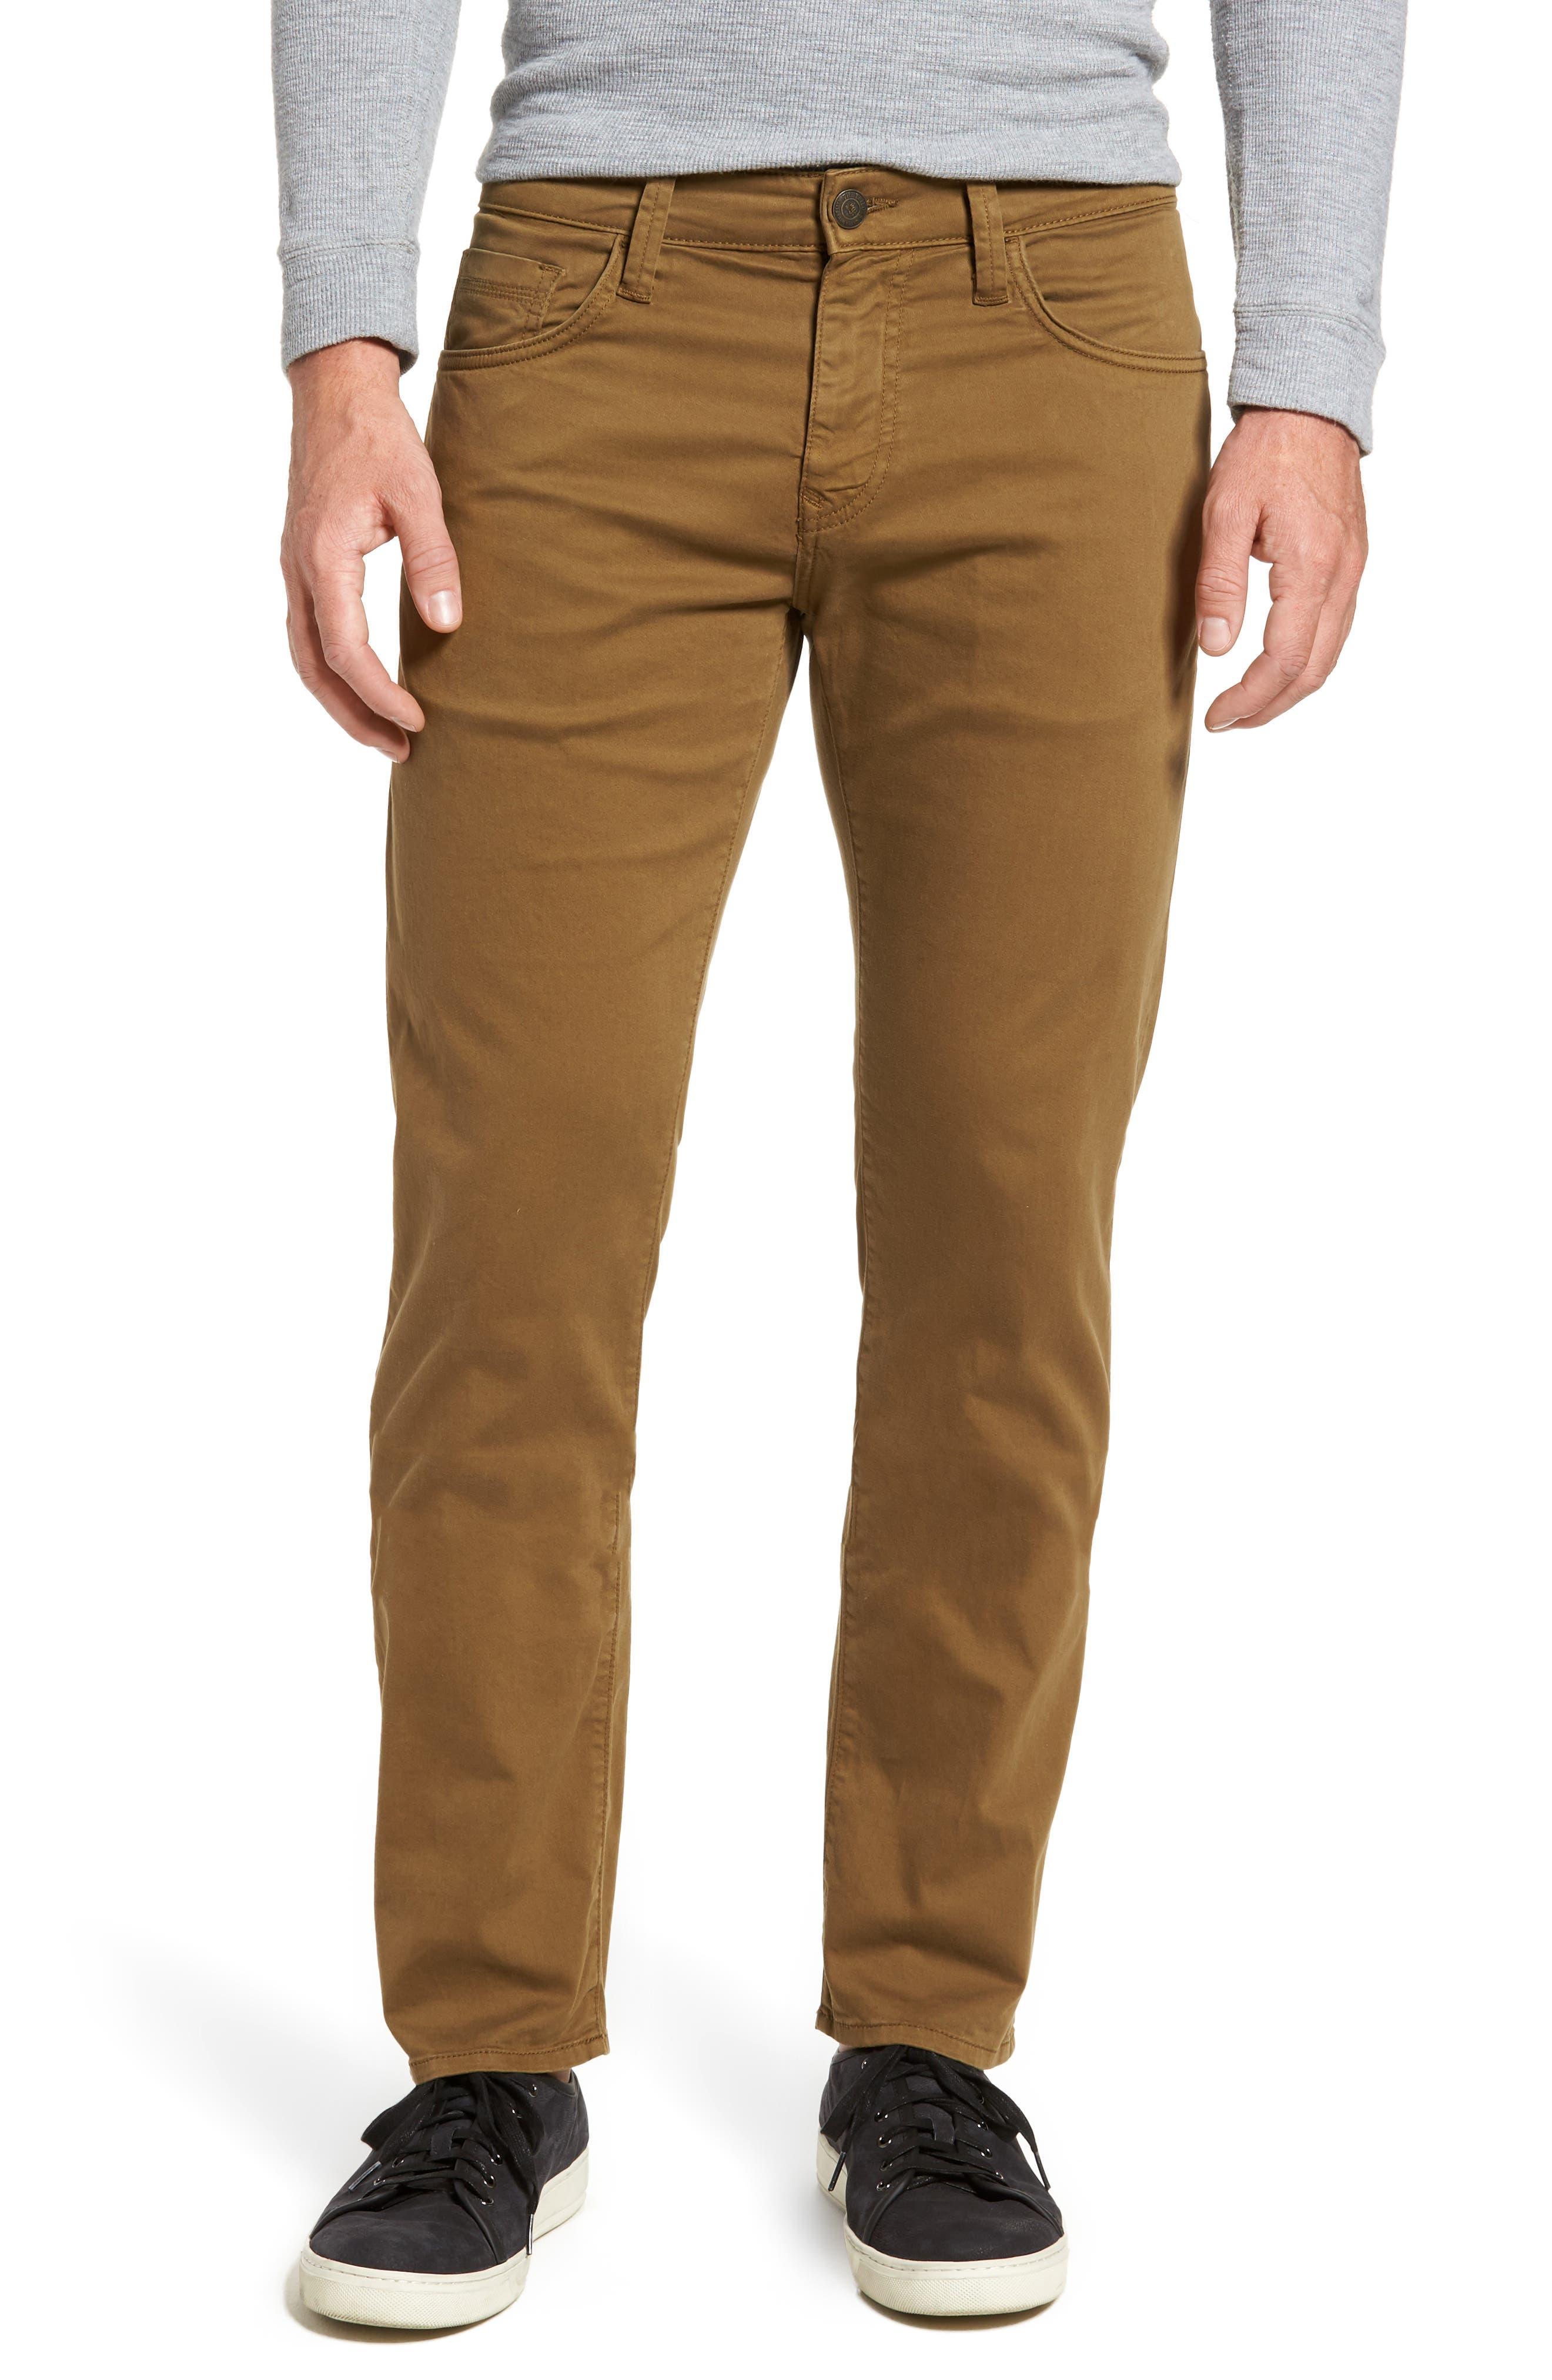 Zach Straight Leg Twill Pants,                         Main,                         color, Kangroo Twill